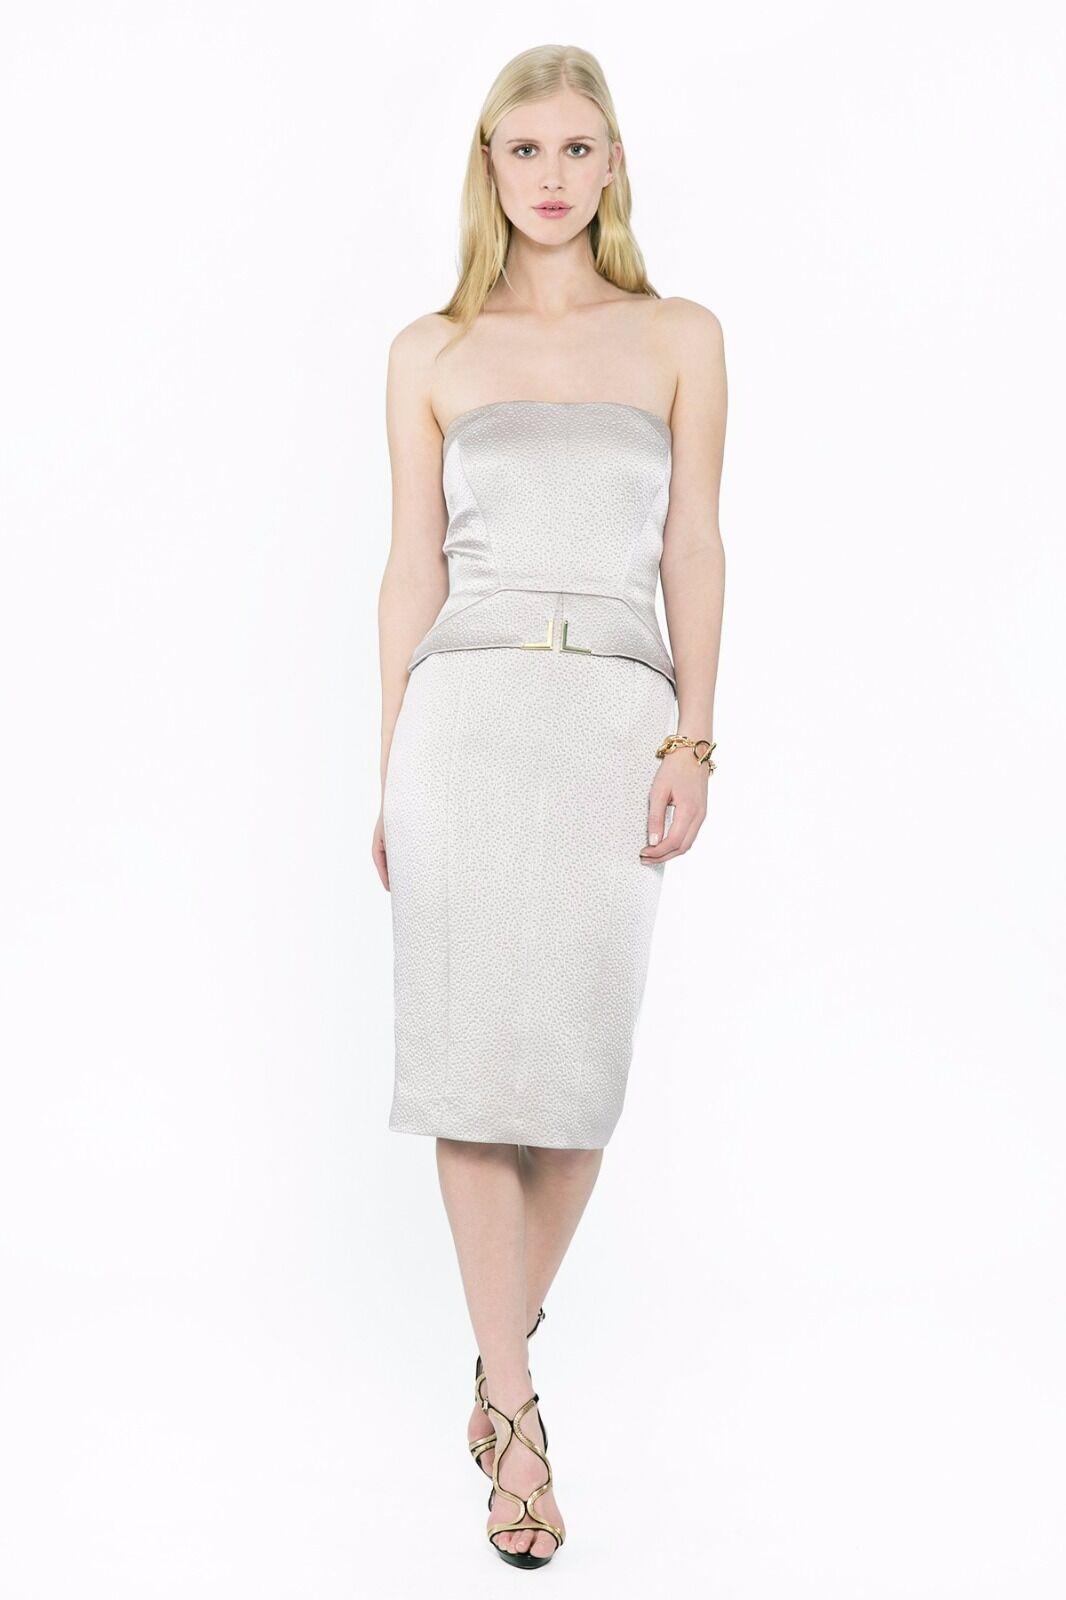 Amanda Wakeley-senza spalline Peplum Dress-Taglia 10-RRP 10-RRP 10-RRP .00 - NUOVA CON ETICHETTA ccc38a